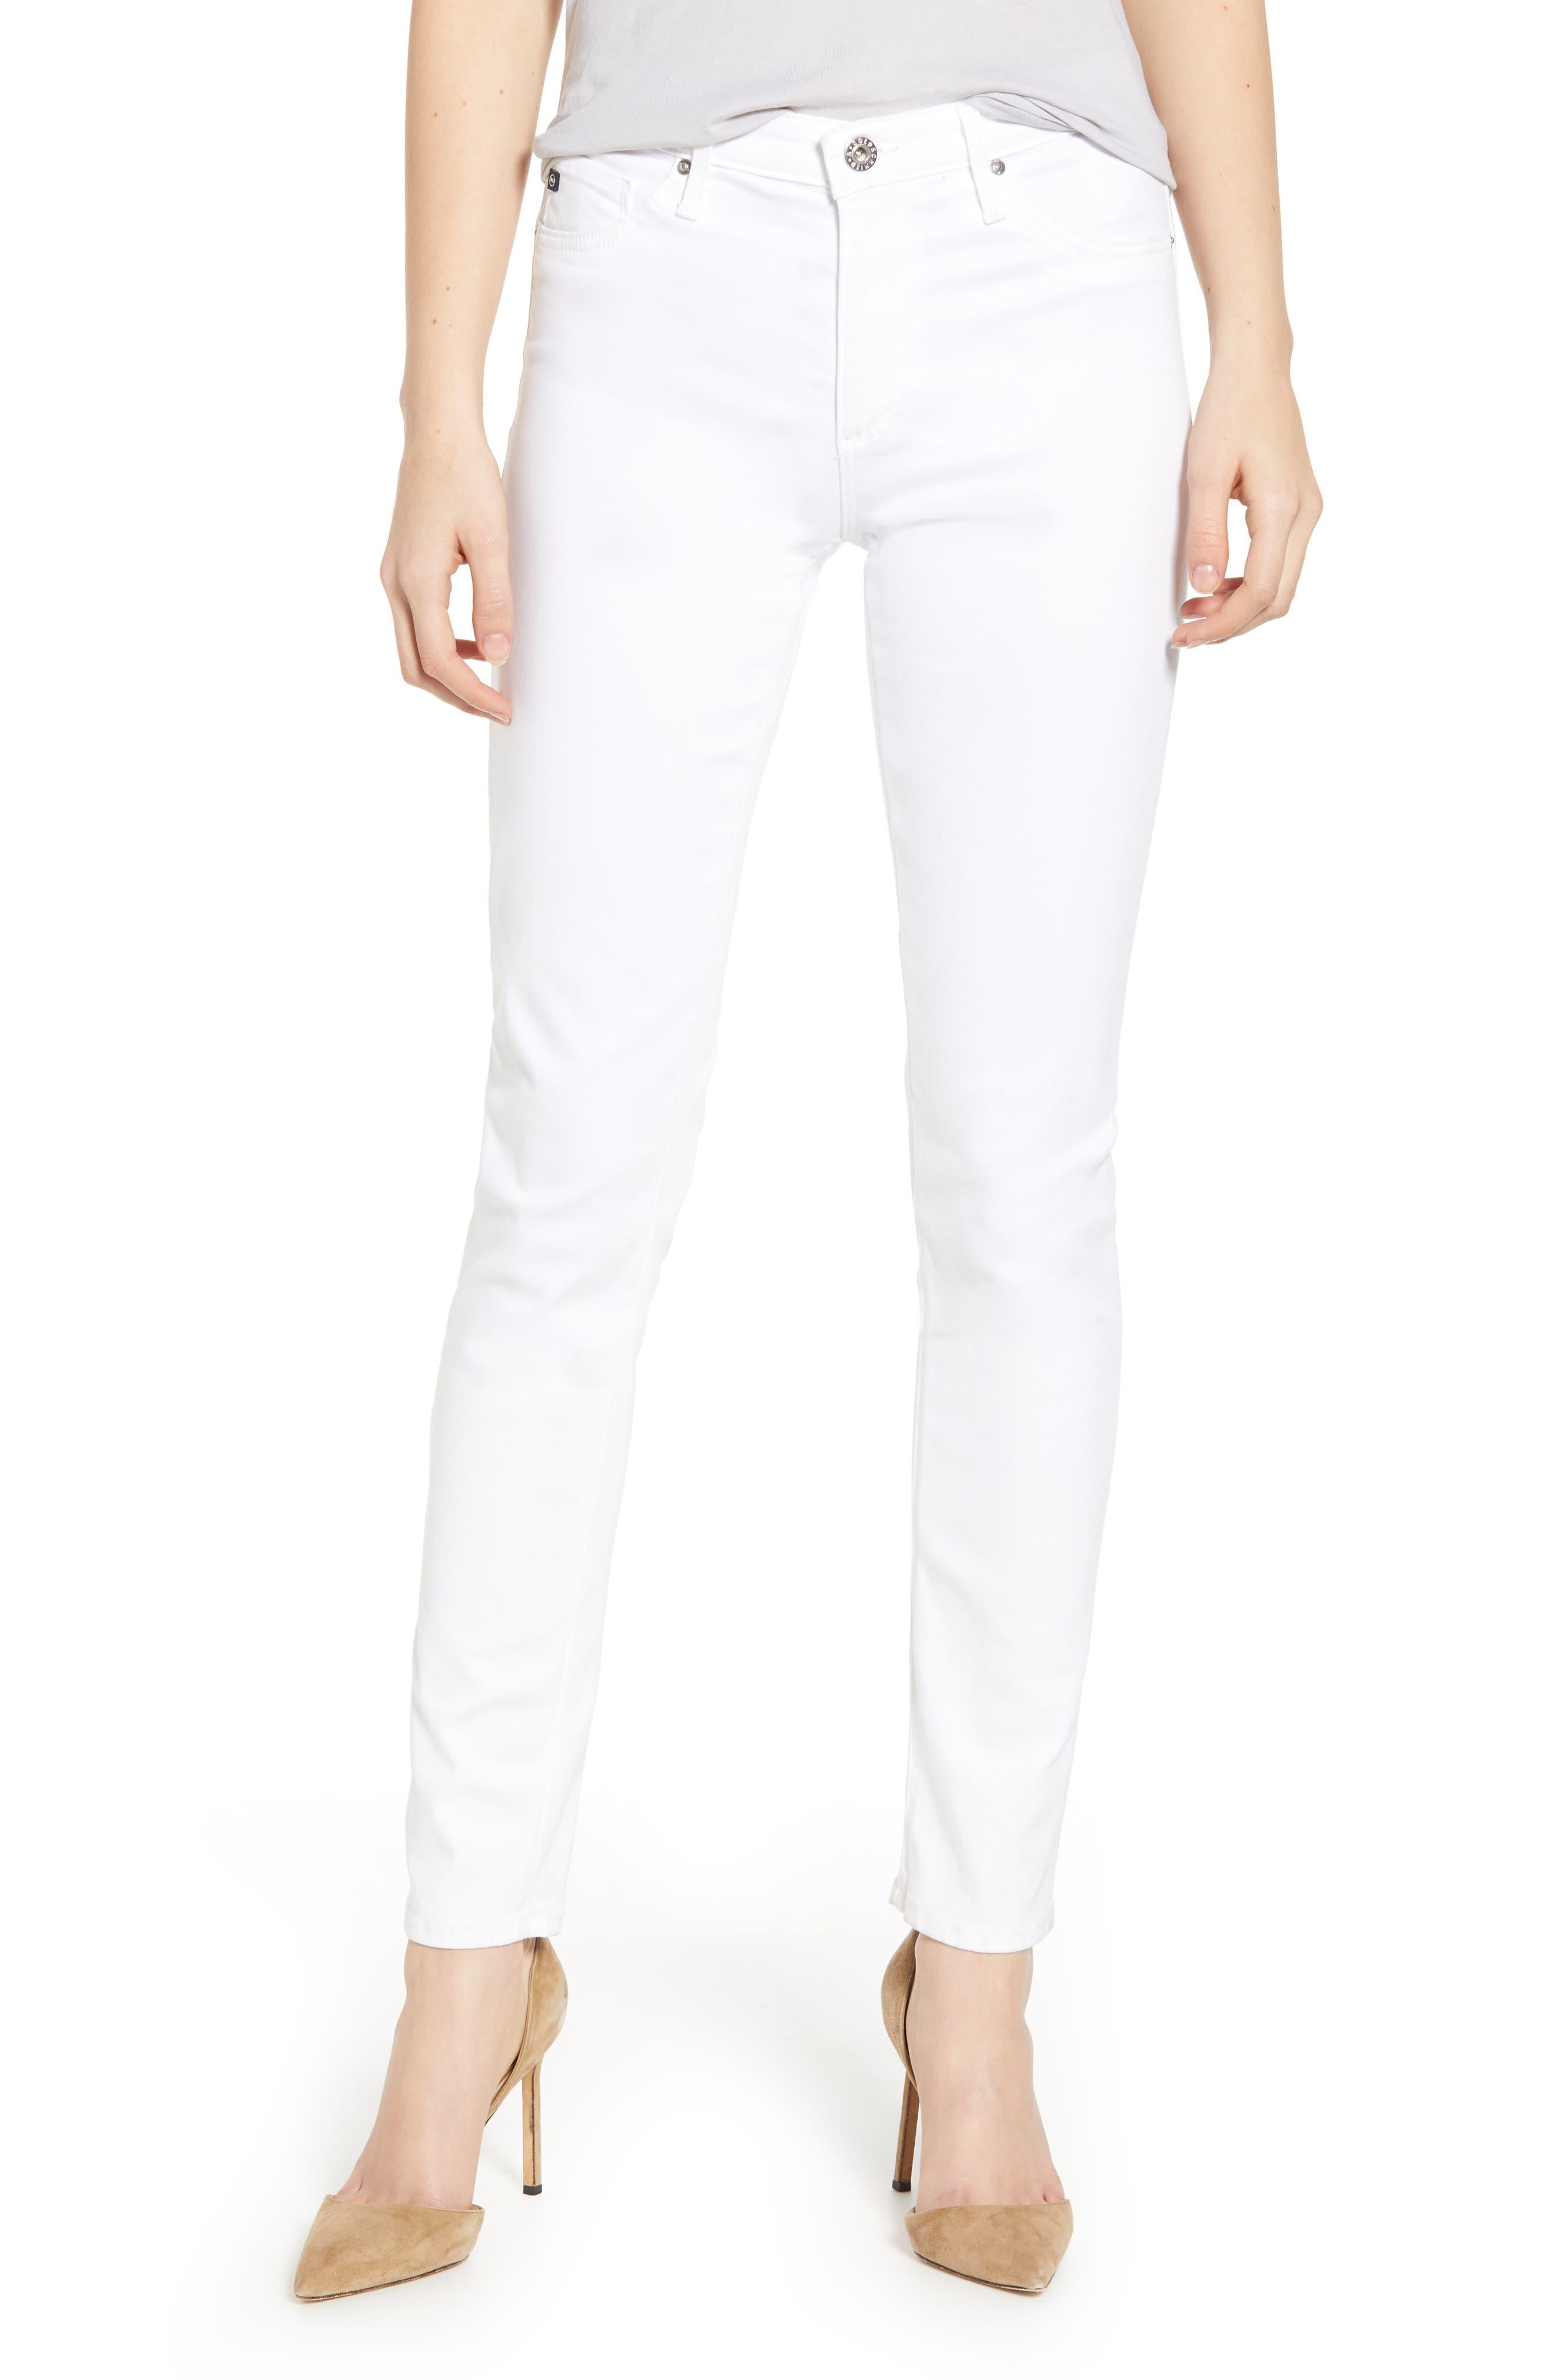 AG 'The Prima' Cigarette Leg Skinny Jeans, Main, color, 110